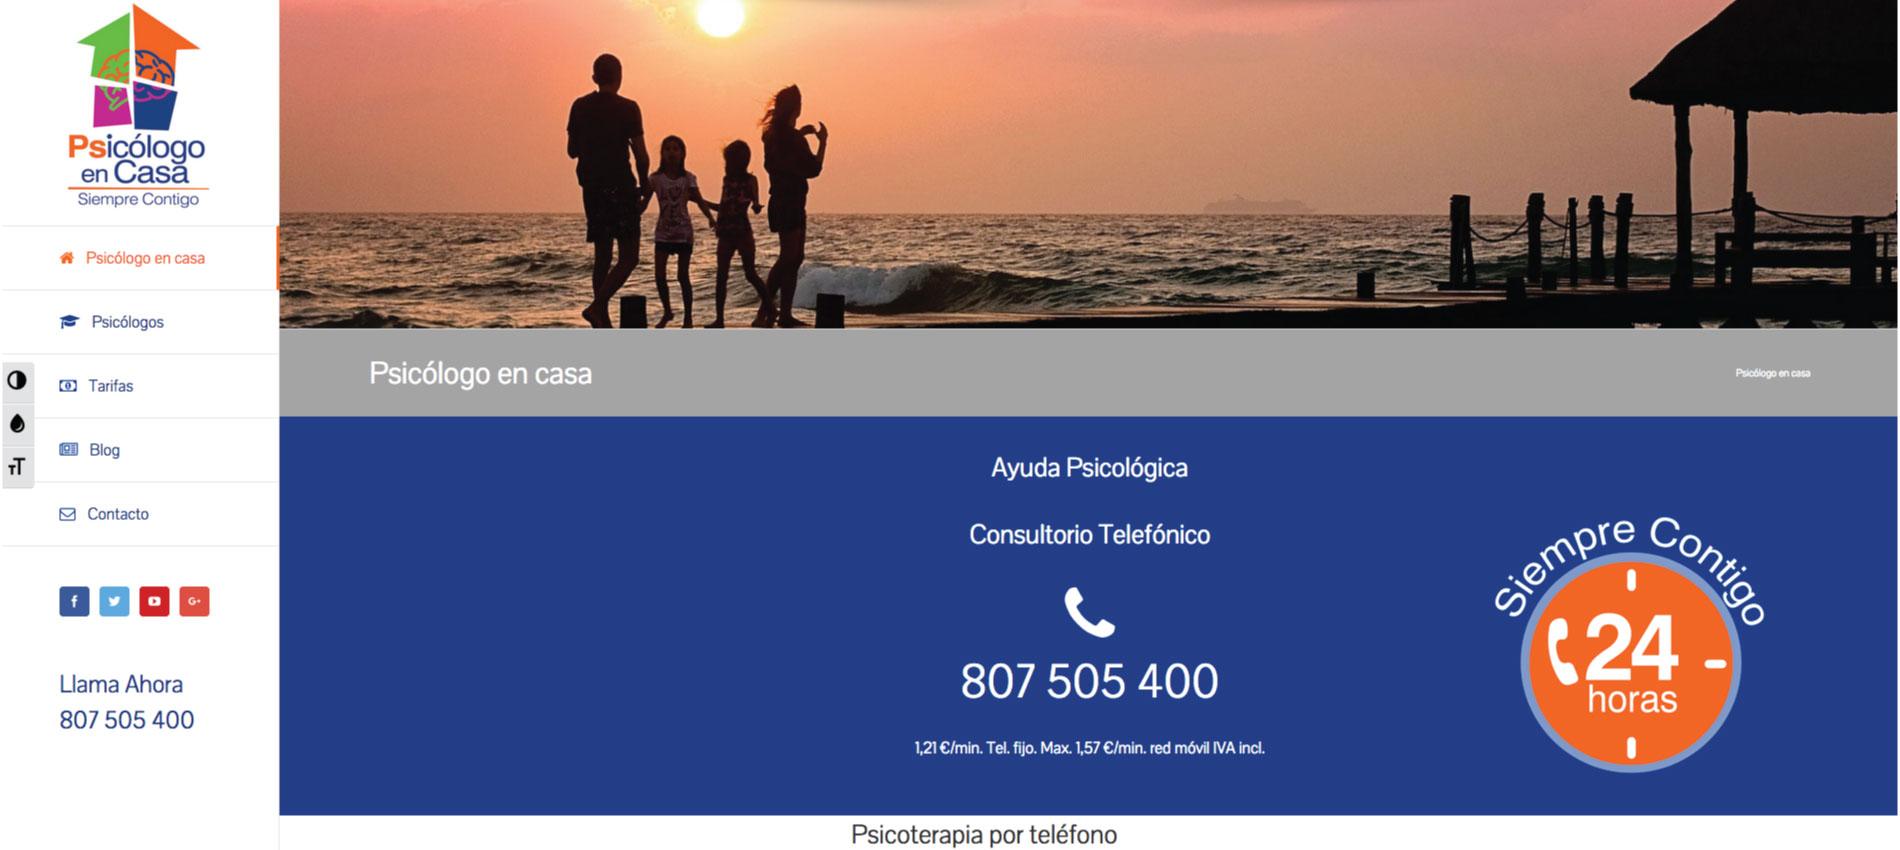 diseño web freelance Psicólogo en Casa